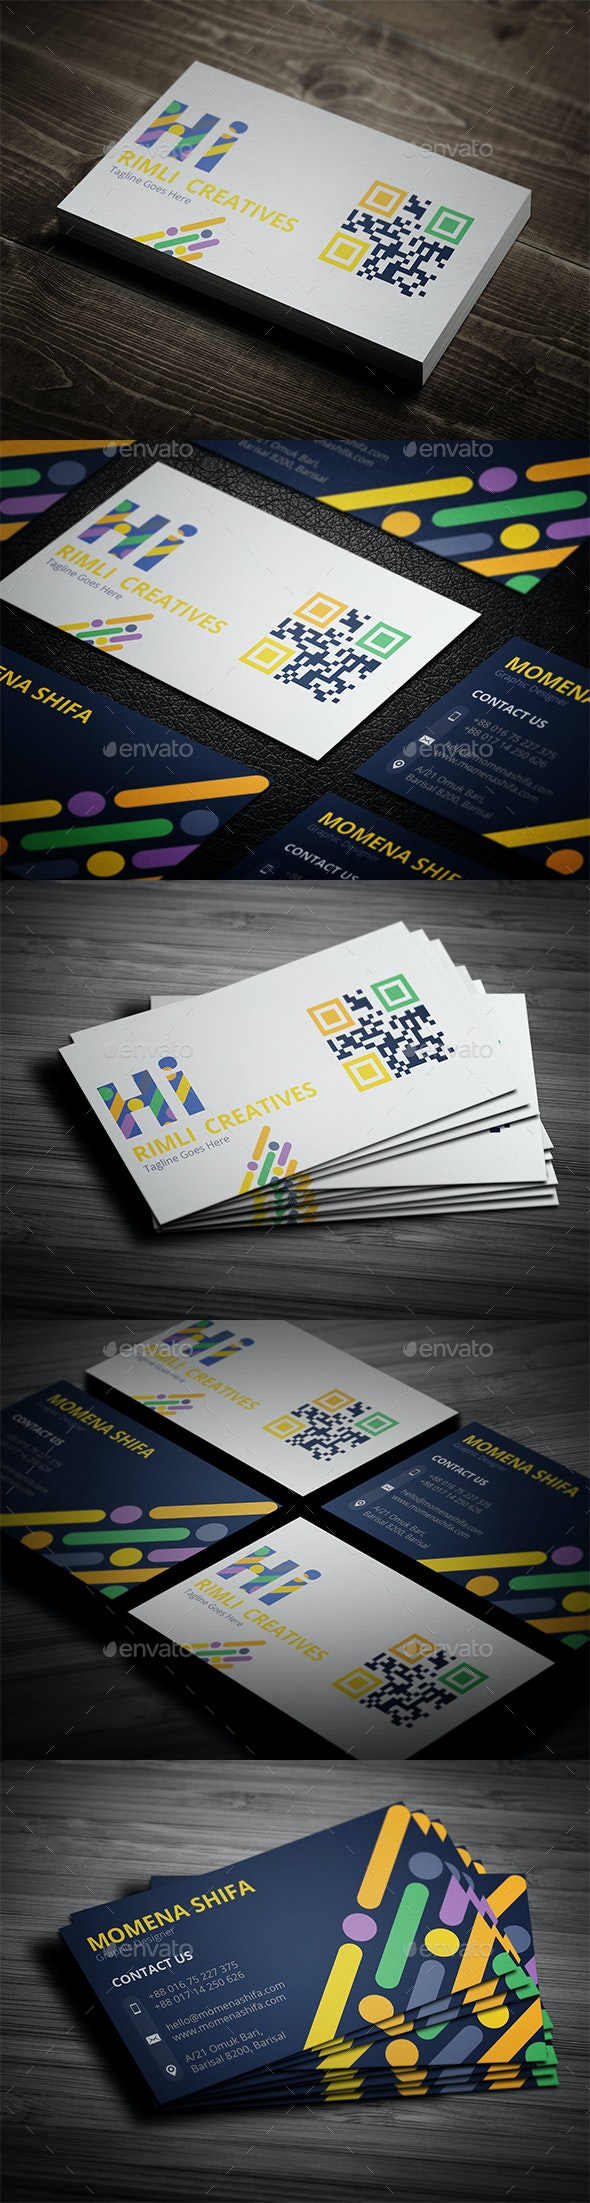 Elegant Business Card Design - Creative Business Cards